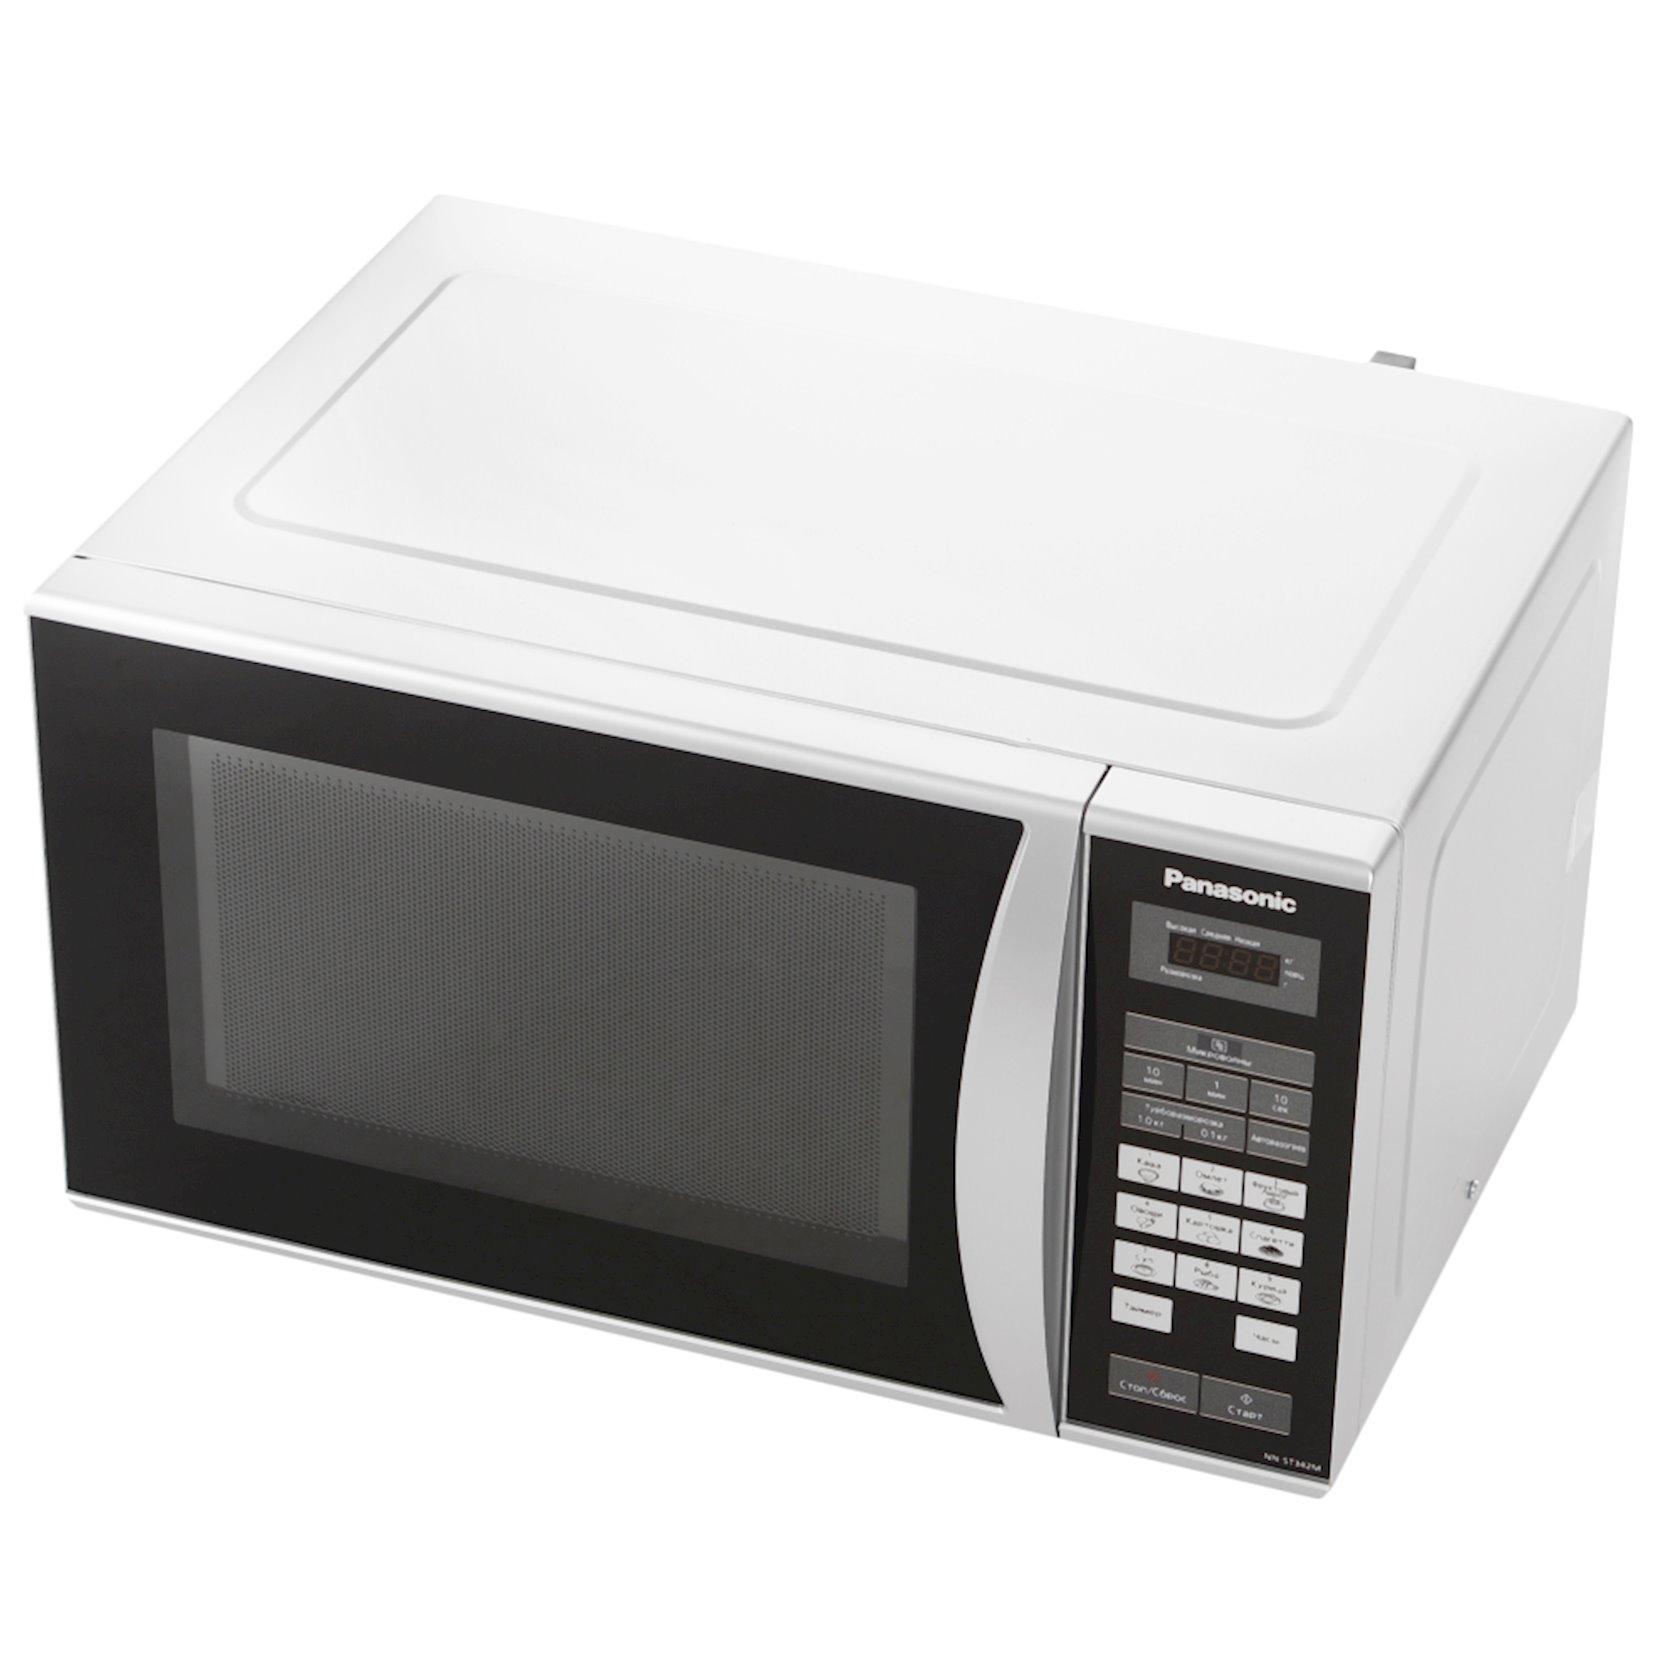 Микроволновая печь Panasonic NN-ST342MZPE 800W, чёрный